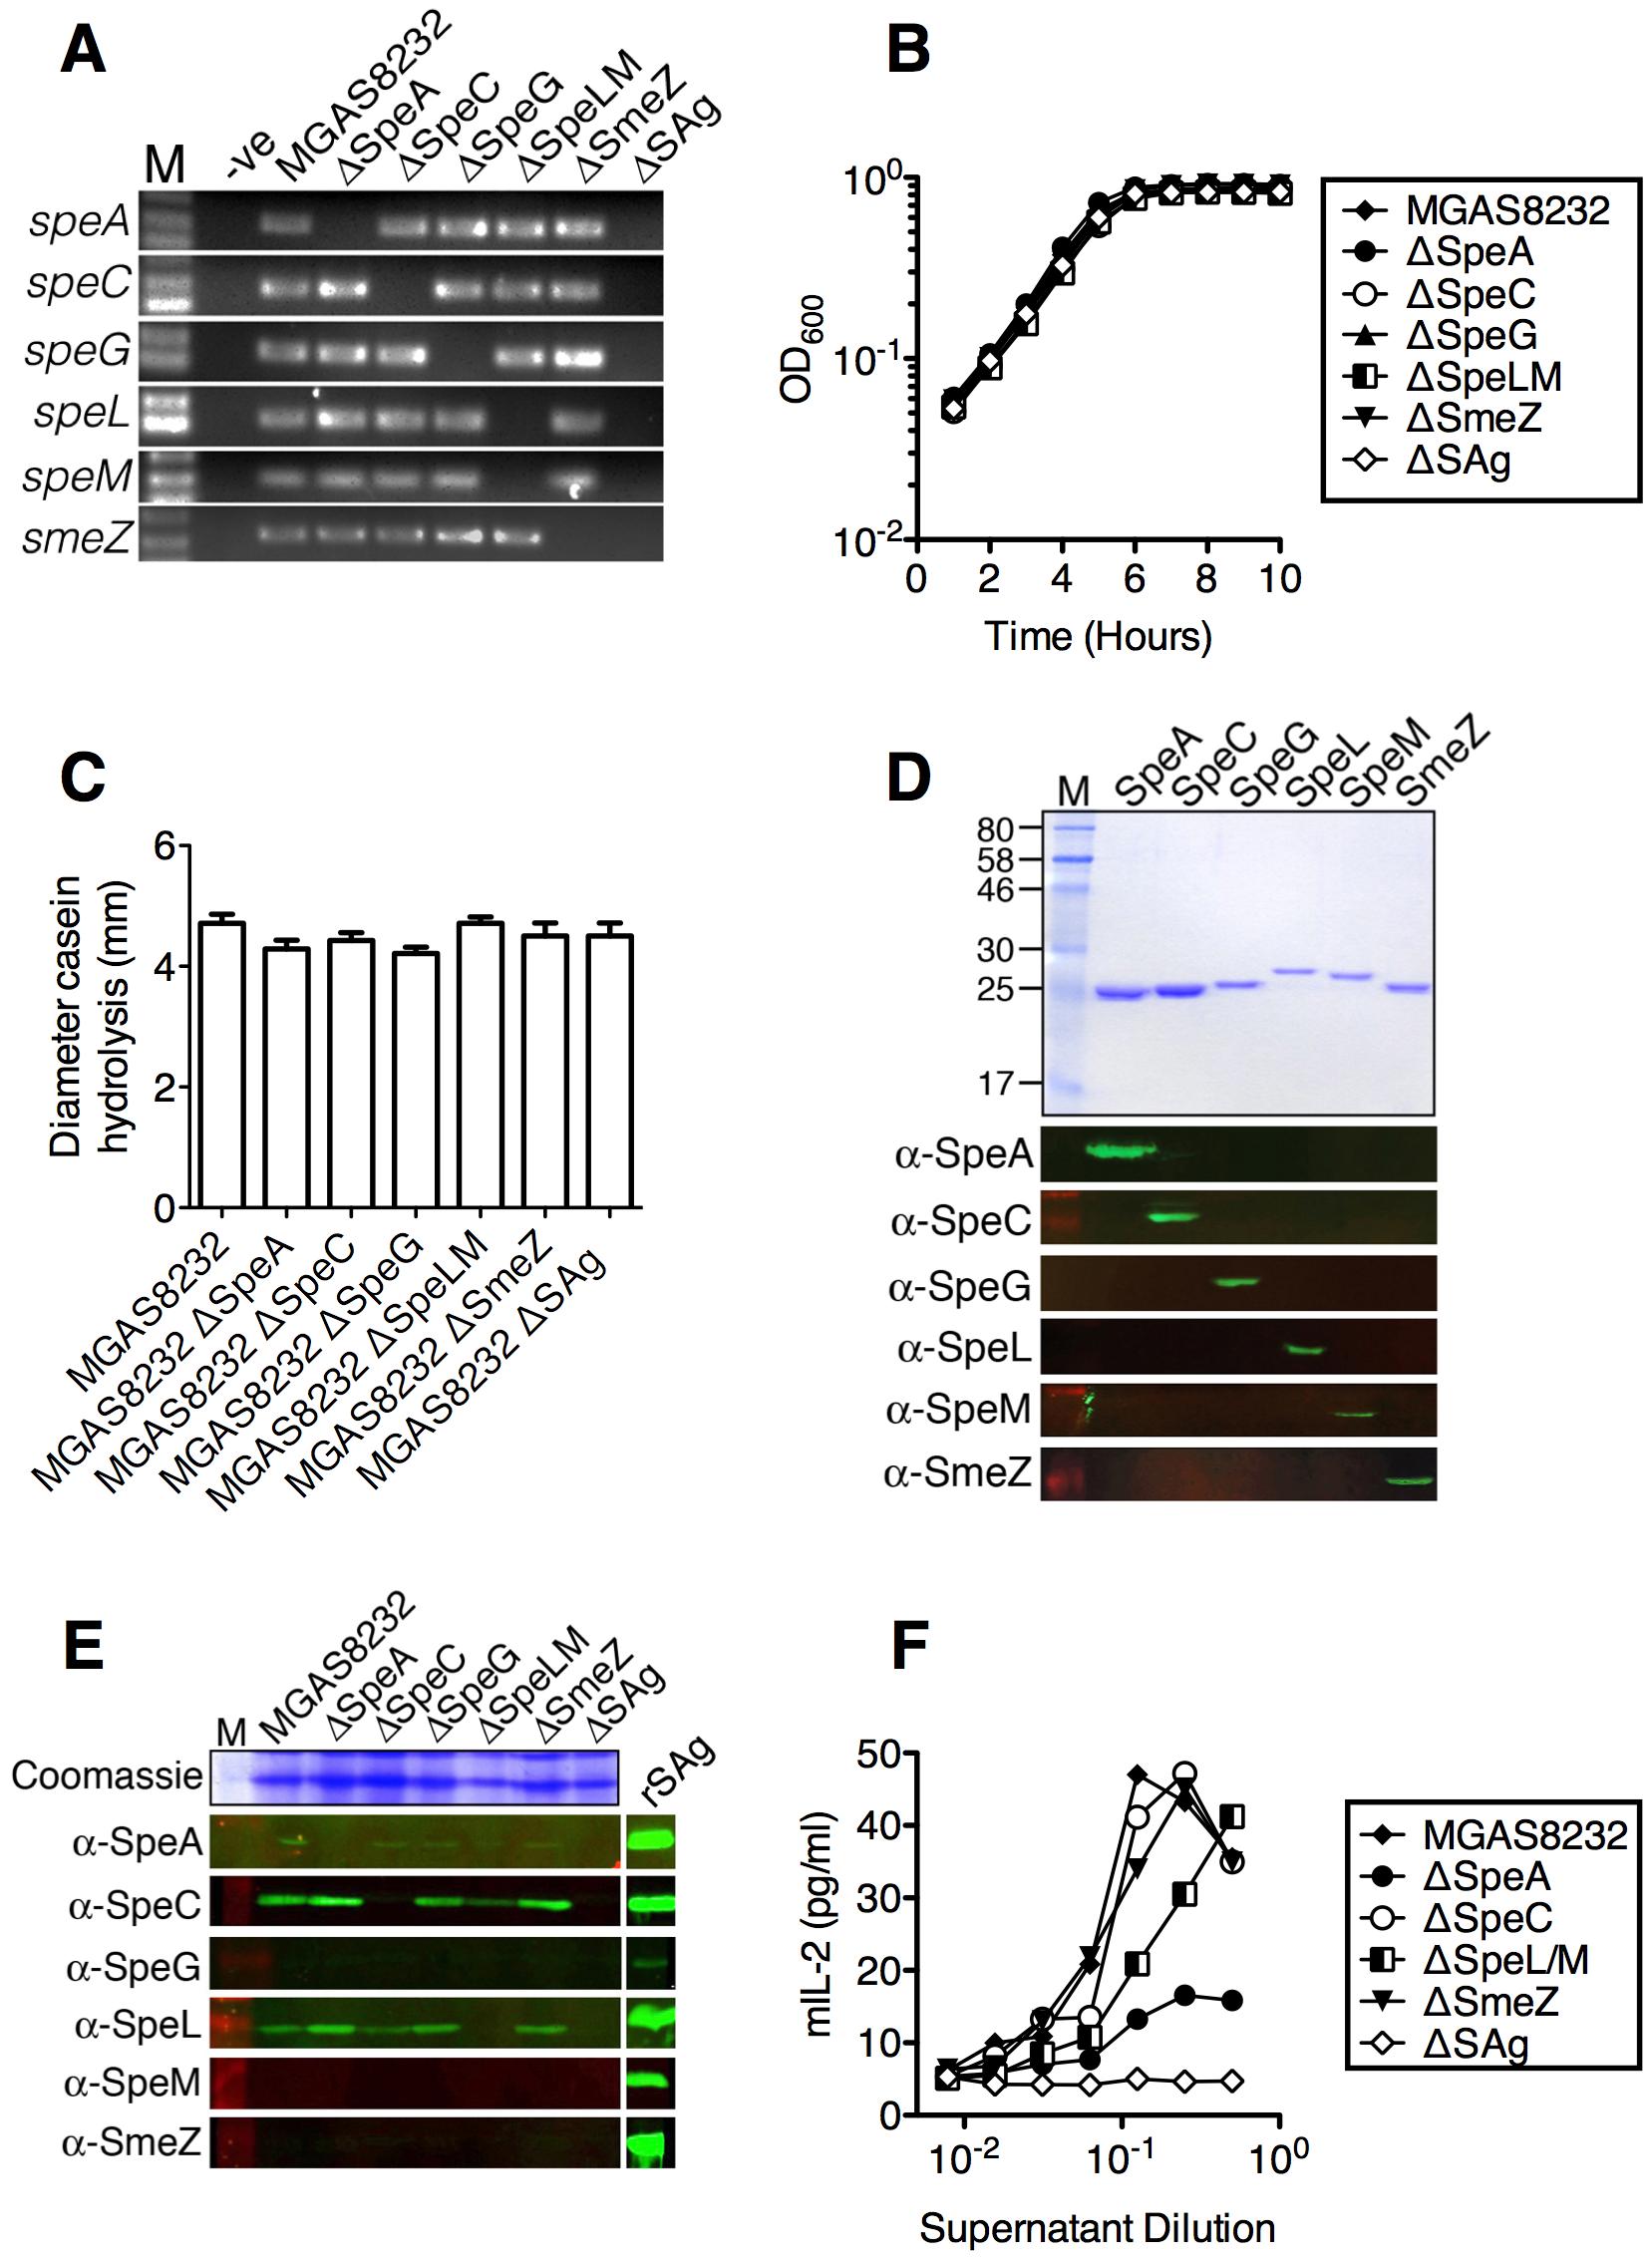 Generation of isogenic <i>S. pyogenes</i> genetic mutants lacking superantigen genes.